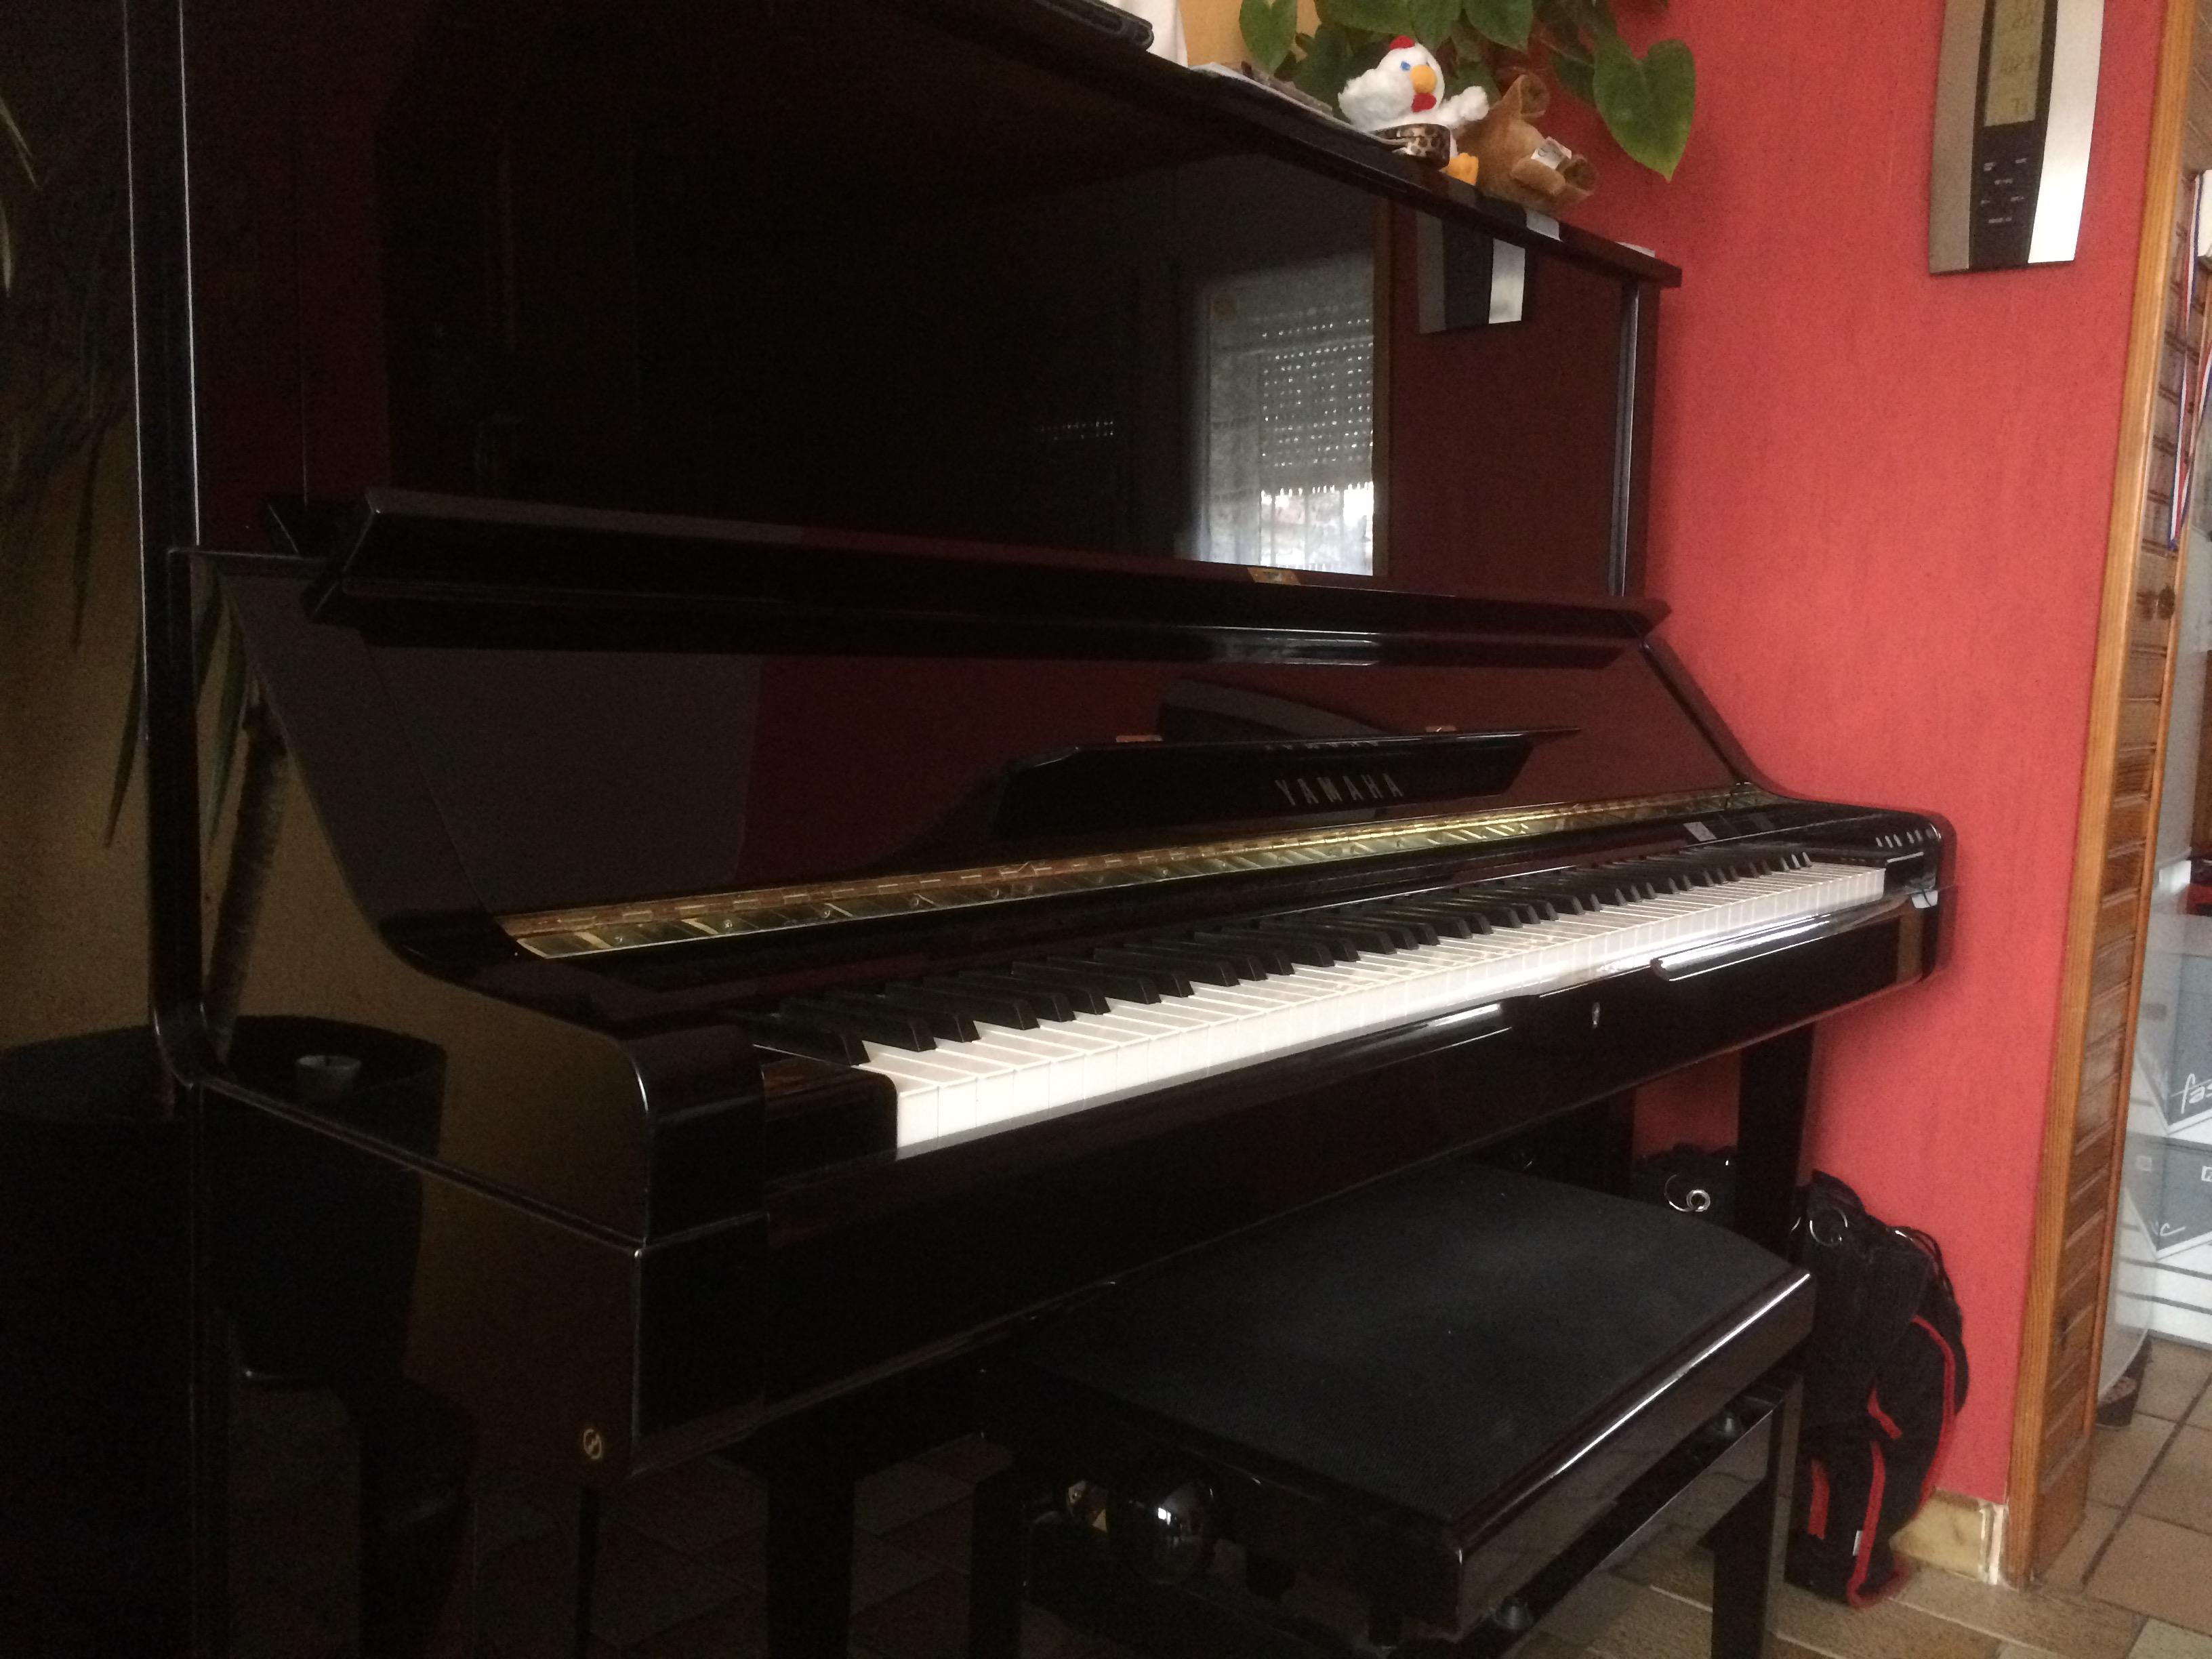 piano droit yamaha ux3 nord pas de calais audiofanzine. Black Bedroom Furniture Sets. Home Design Ideas